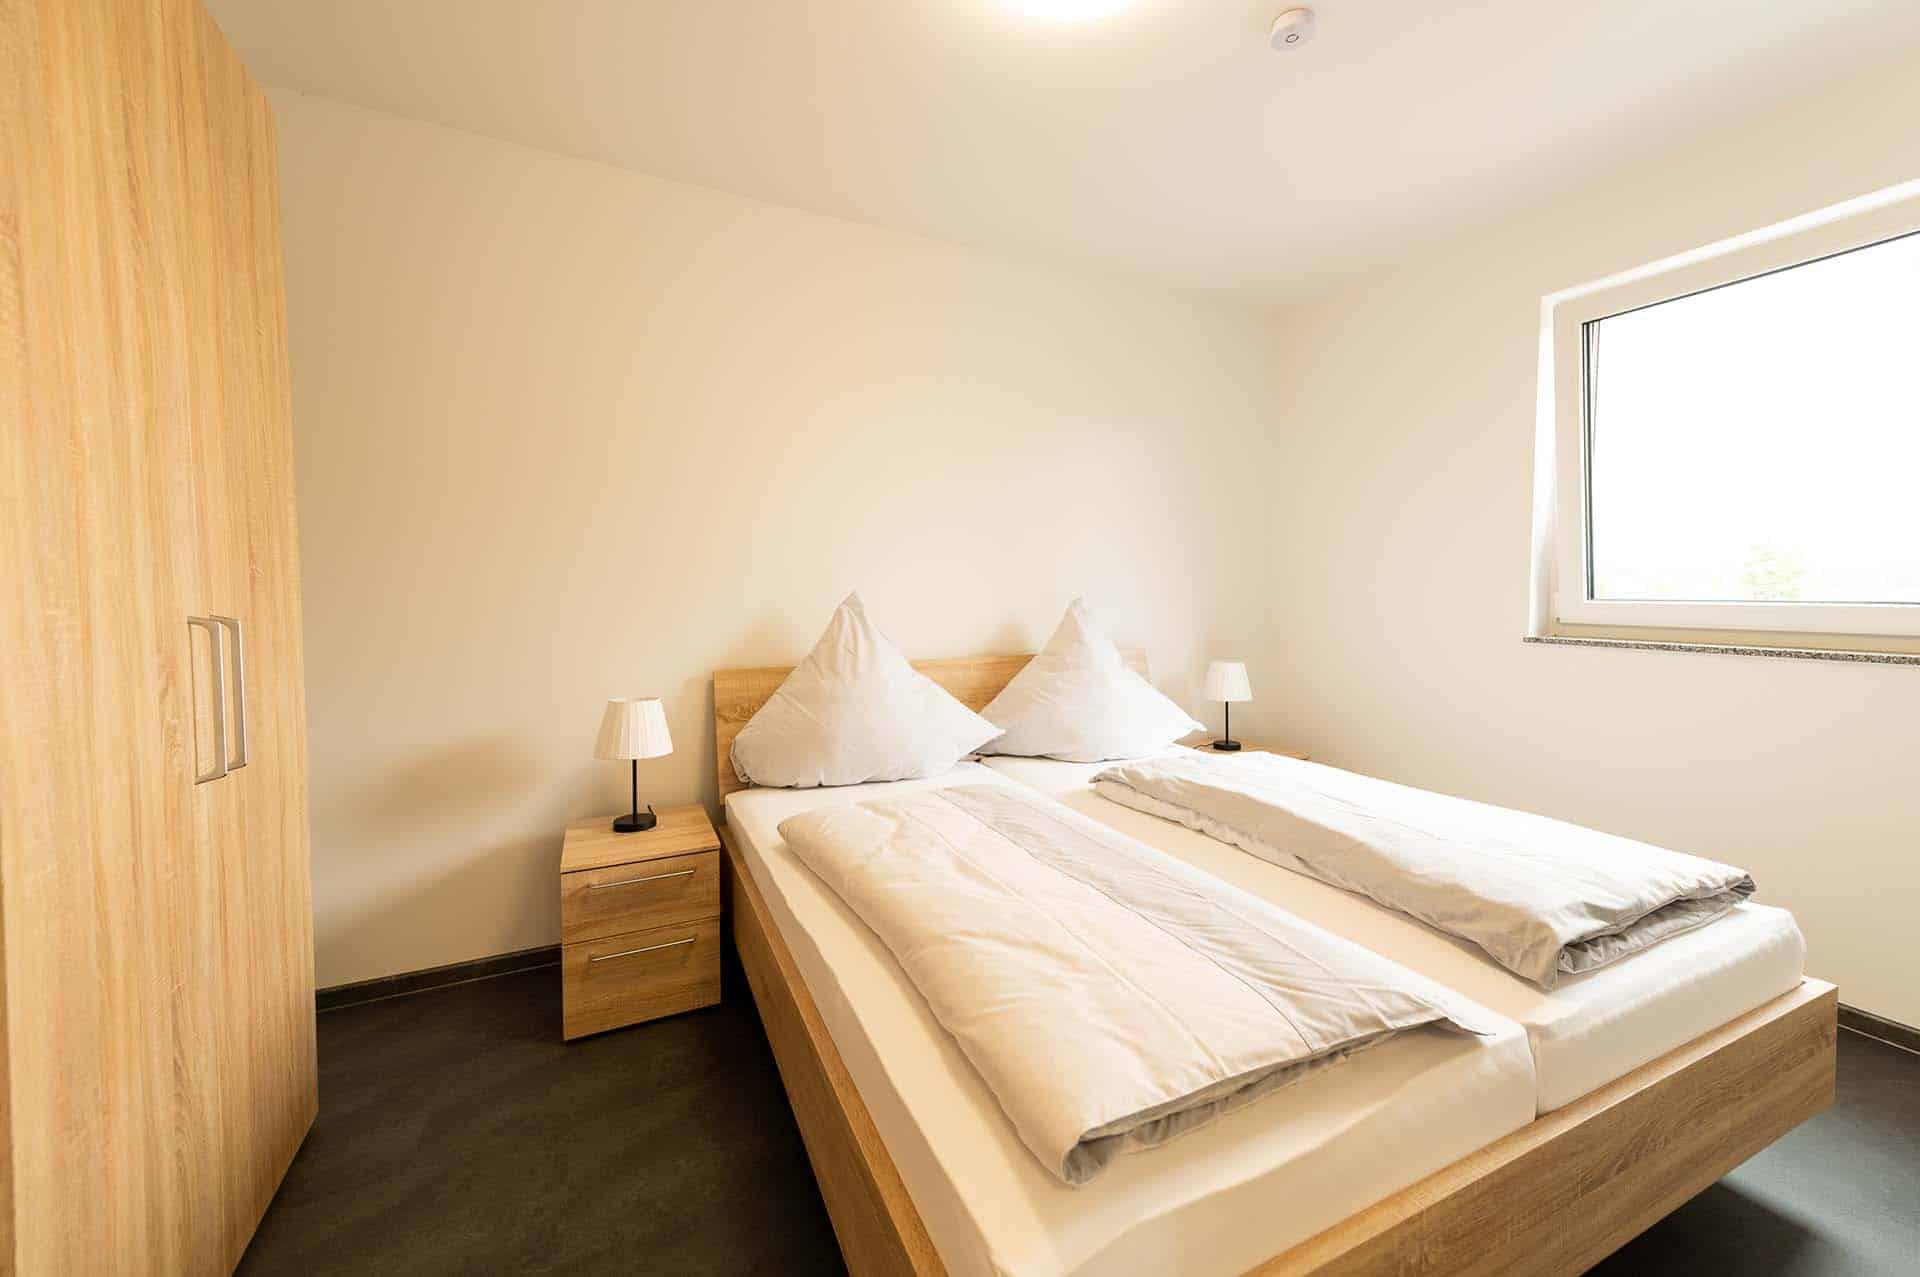 appartement-baumwipfelpfad-saarschleife-doppelbett